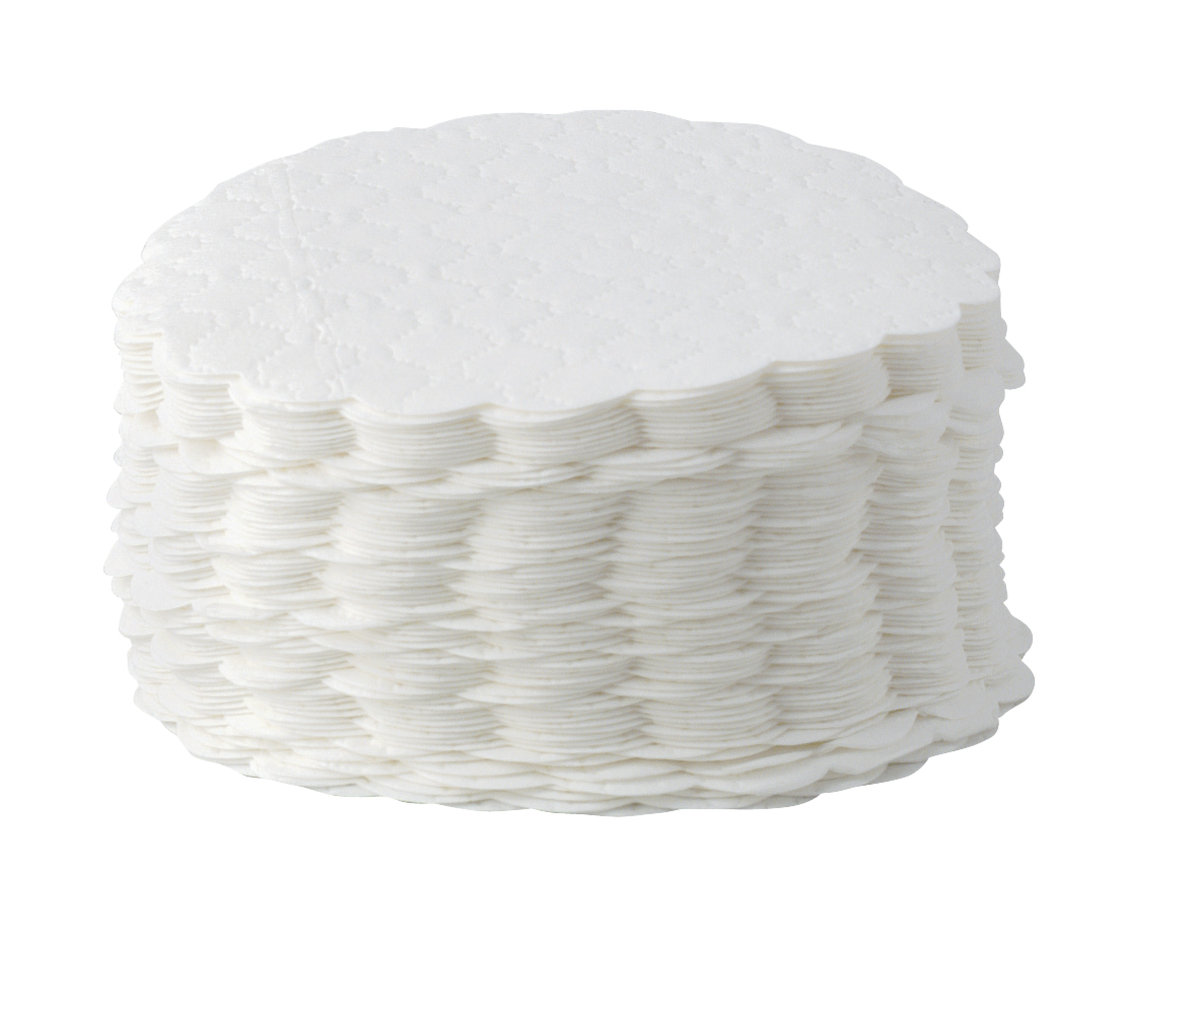 Gobelet rond blanc Ø 9 cm (1000 pièces)